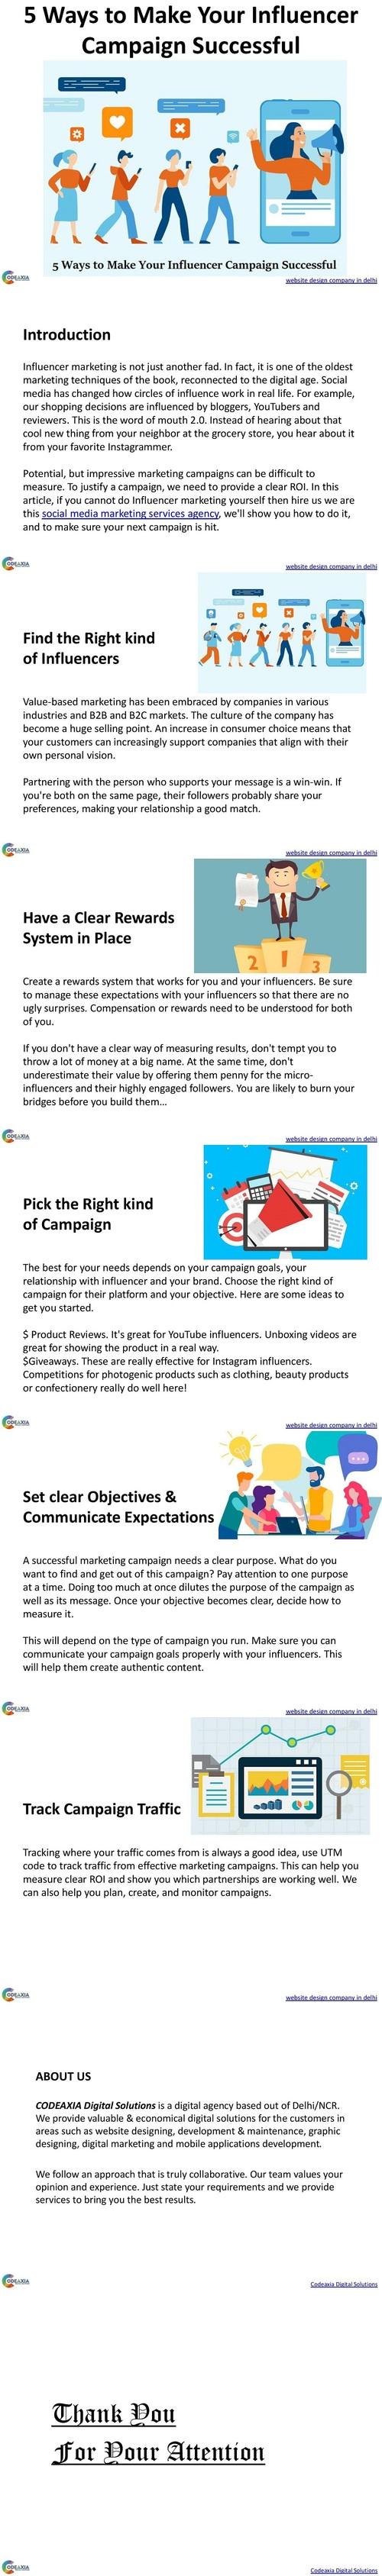 5 Ways to Make Your Influencer Campaign Successful via Shalini Khurana